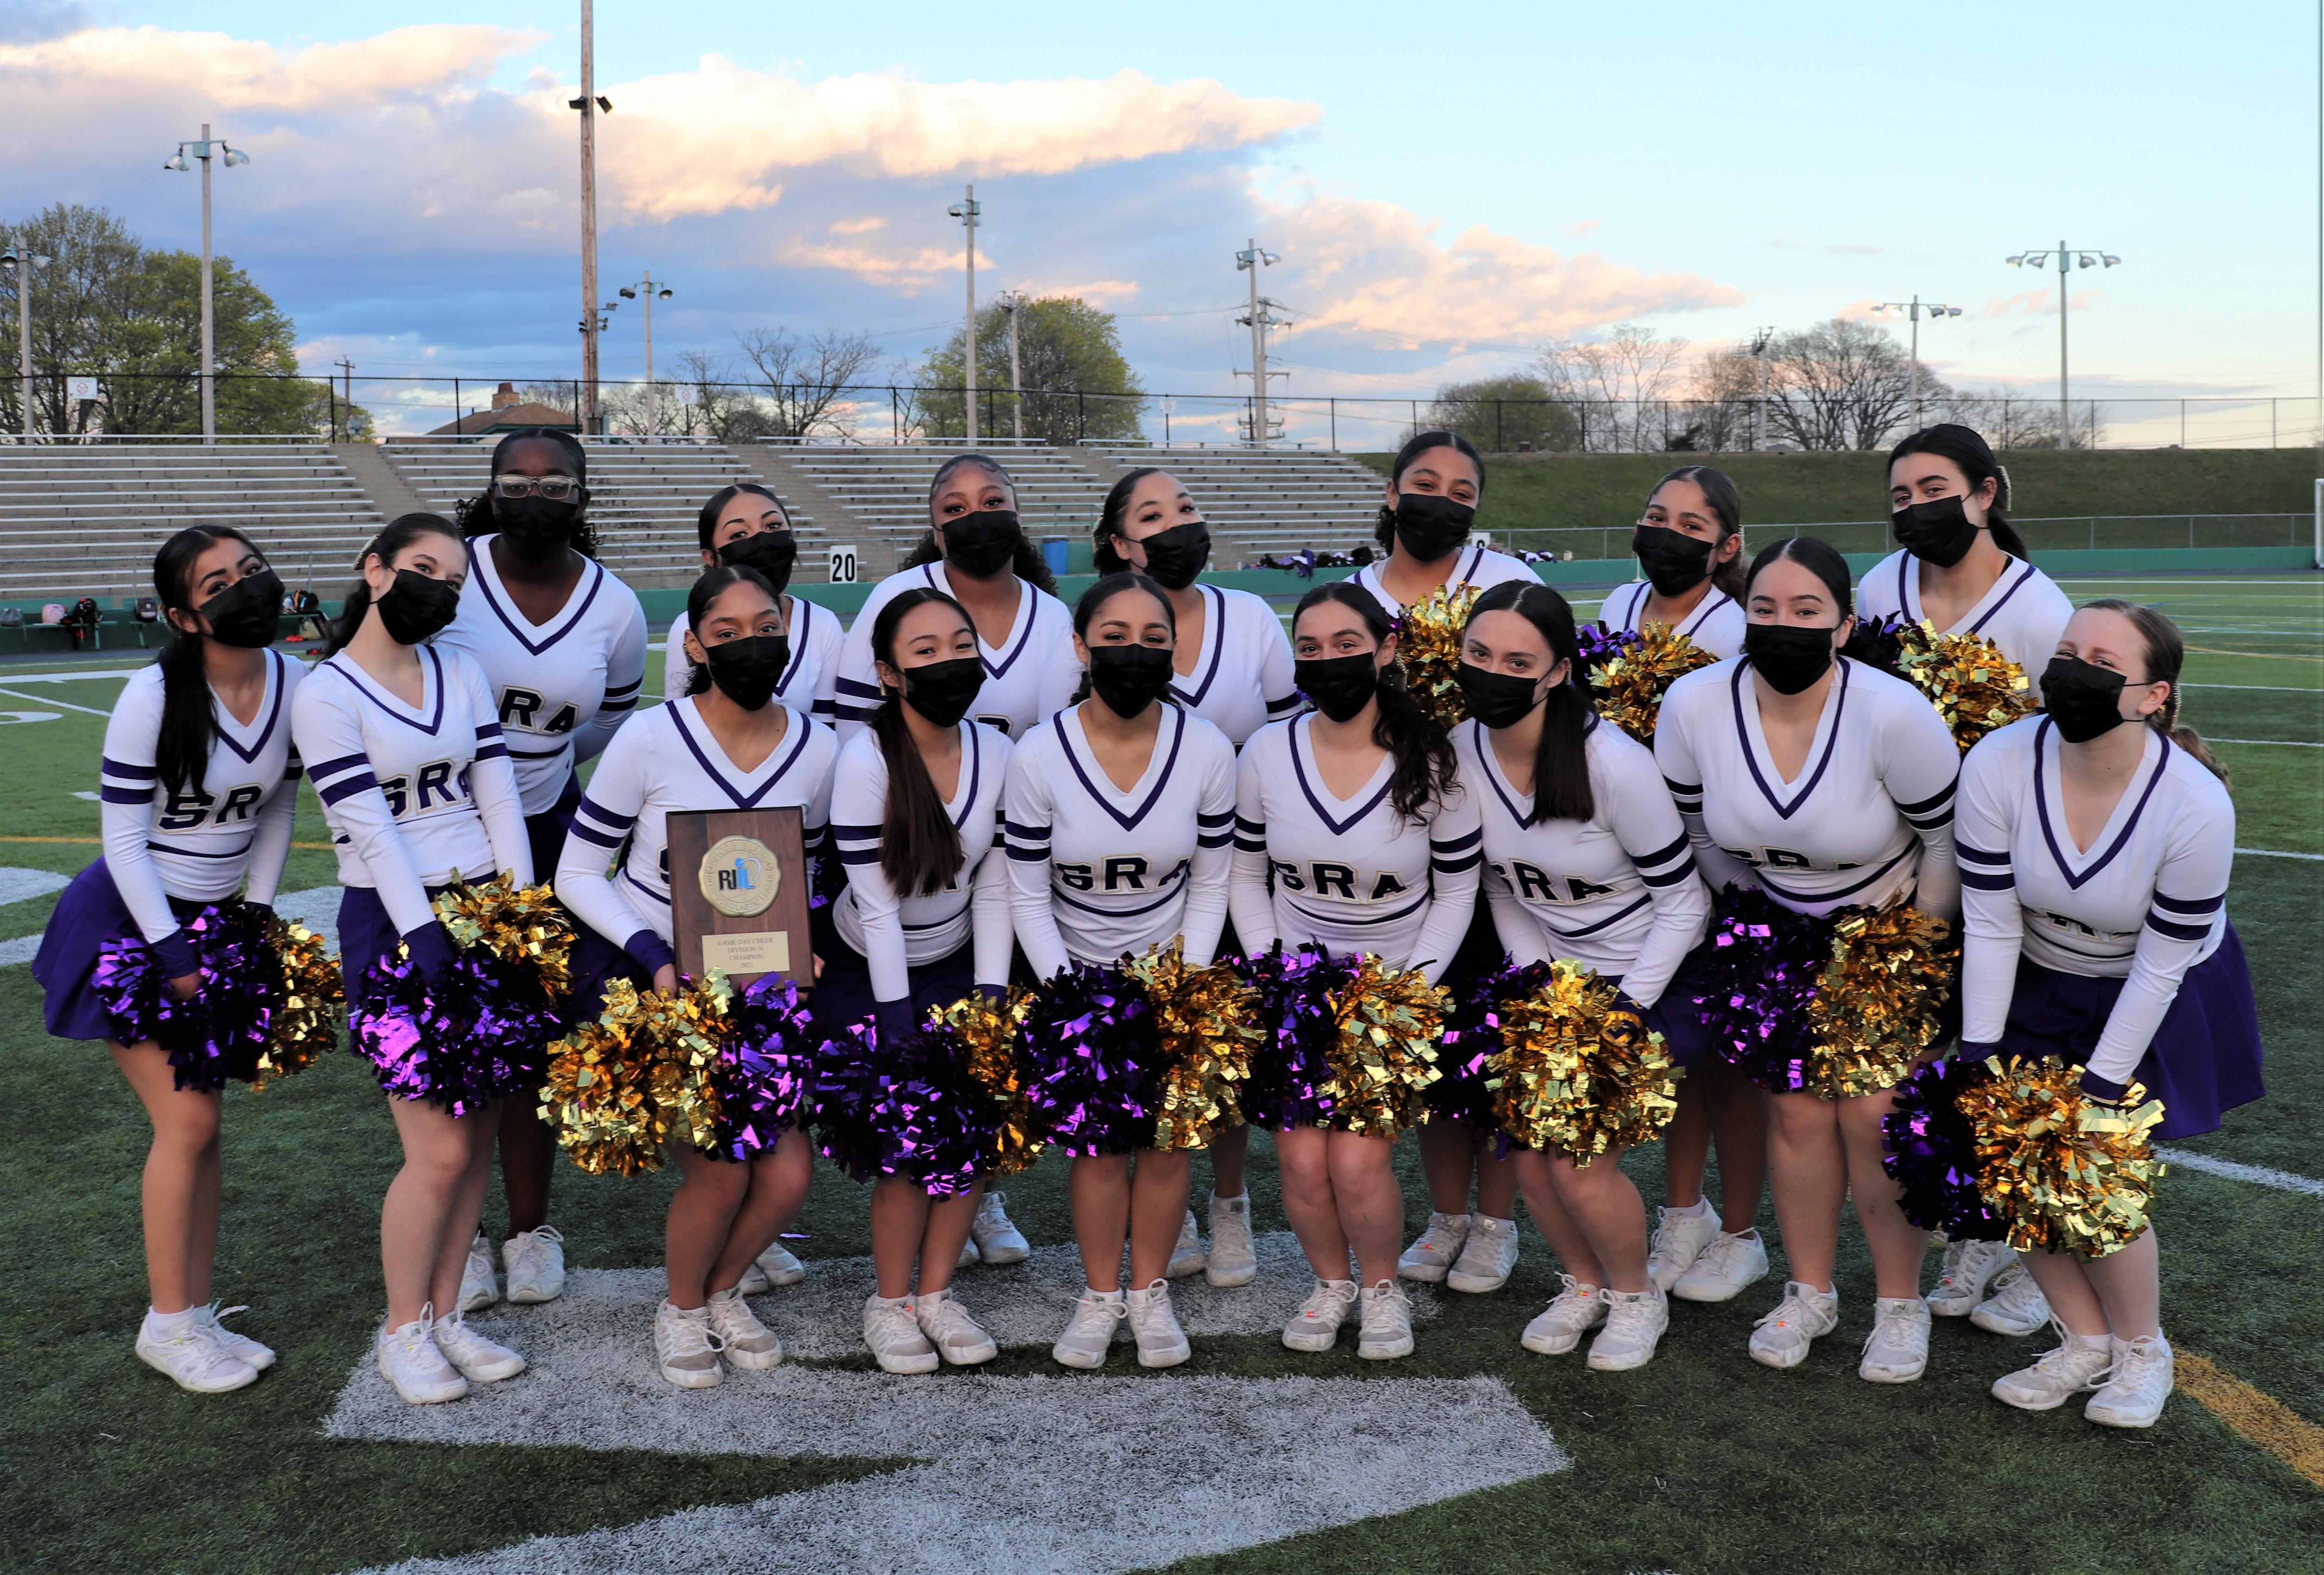 St. Raphael Academy Cheerleading Team